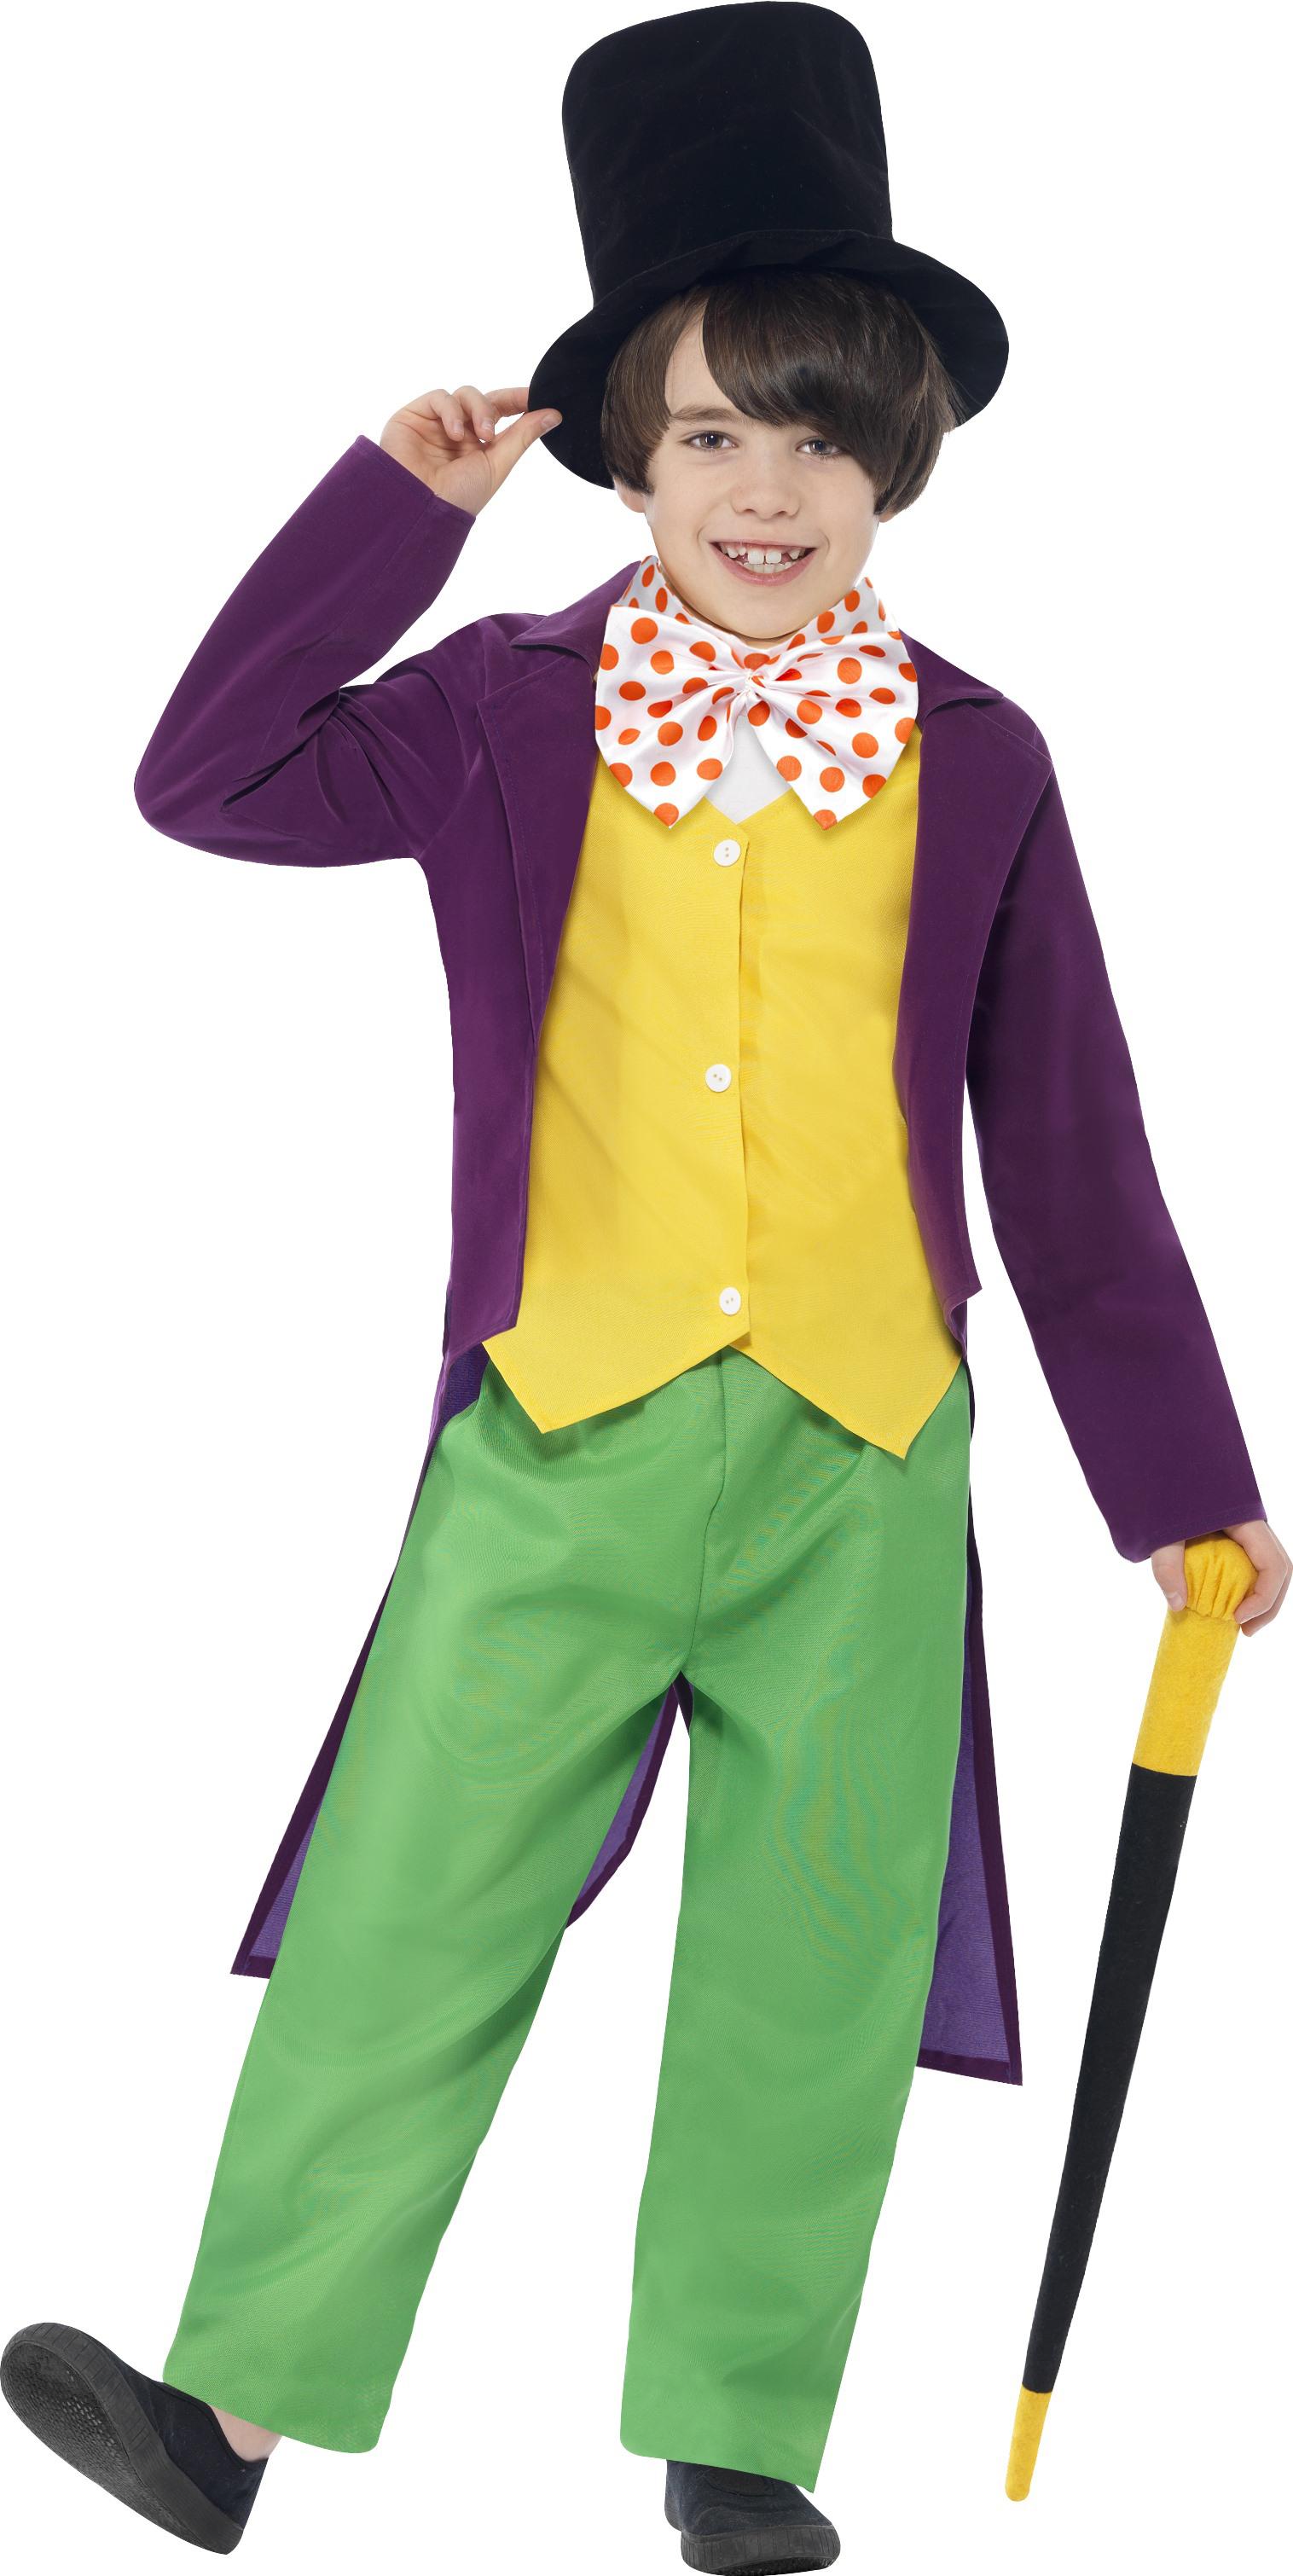 Good Sentinel Willy Wonka World Book Day Kids Fancy Dress Roald Dahl Boys  Character Costume